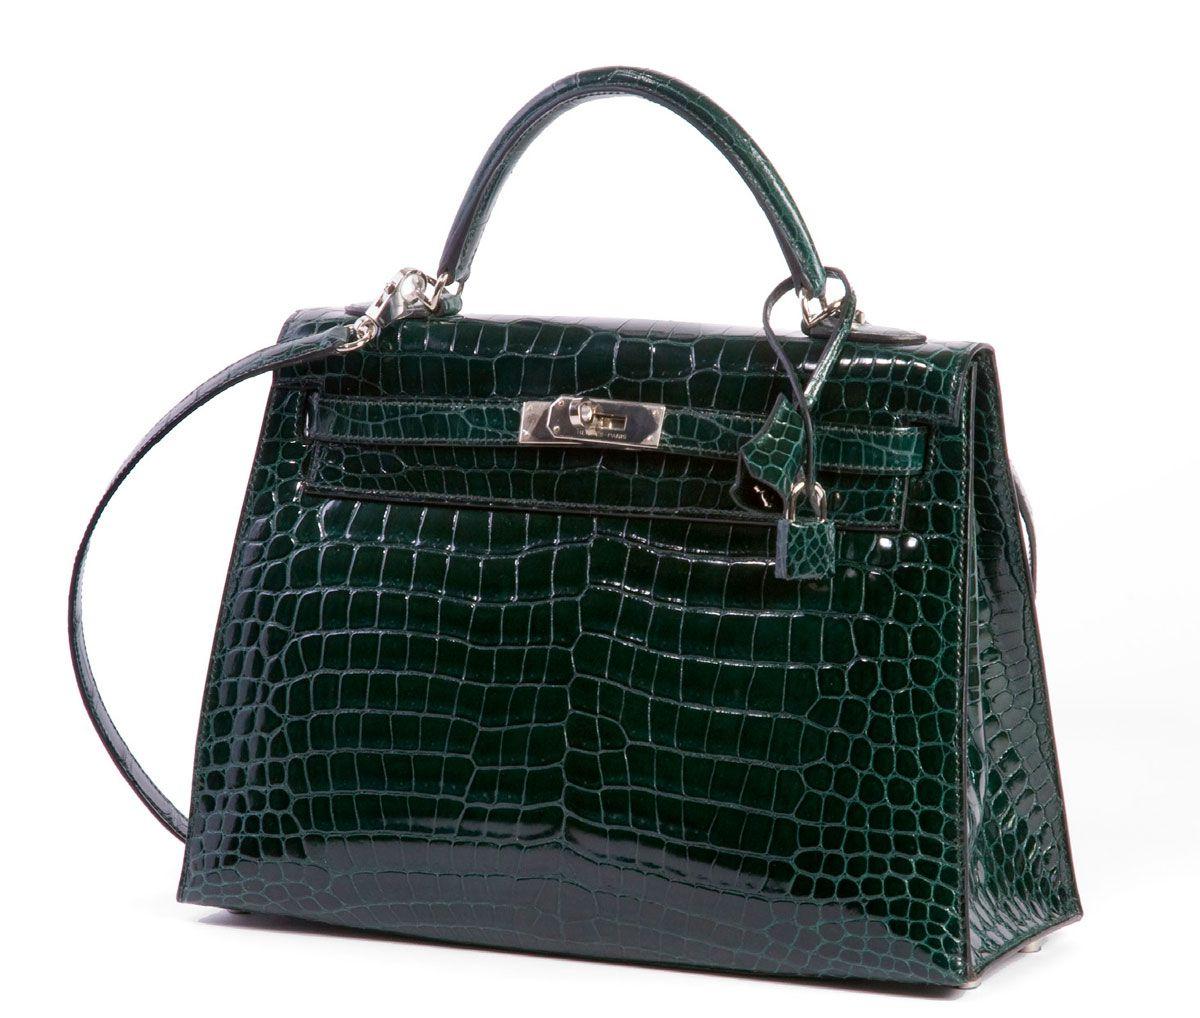 829d1893f239 hermes green crocodile kelly bag